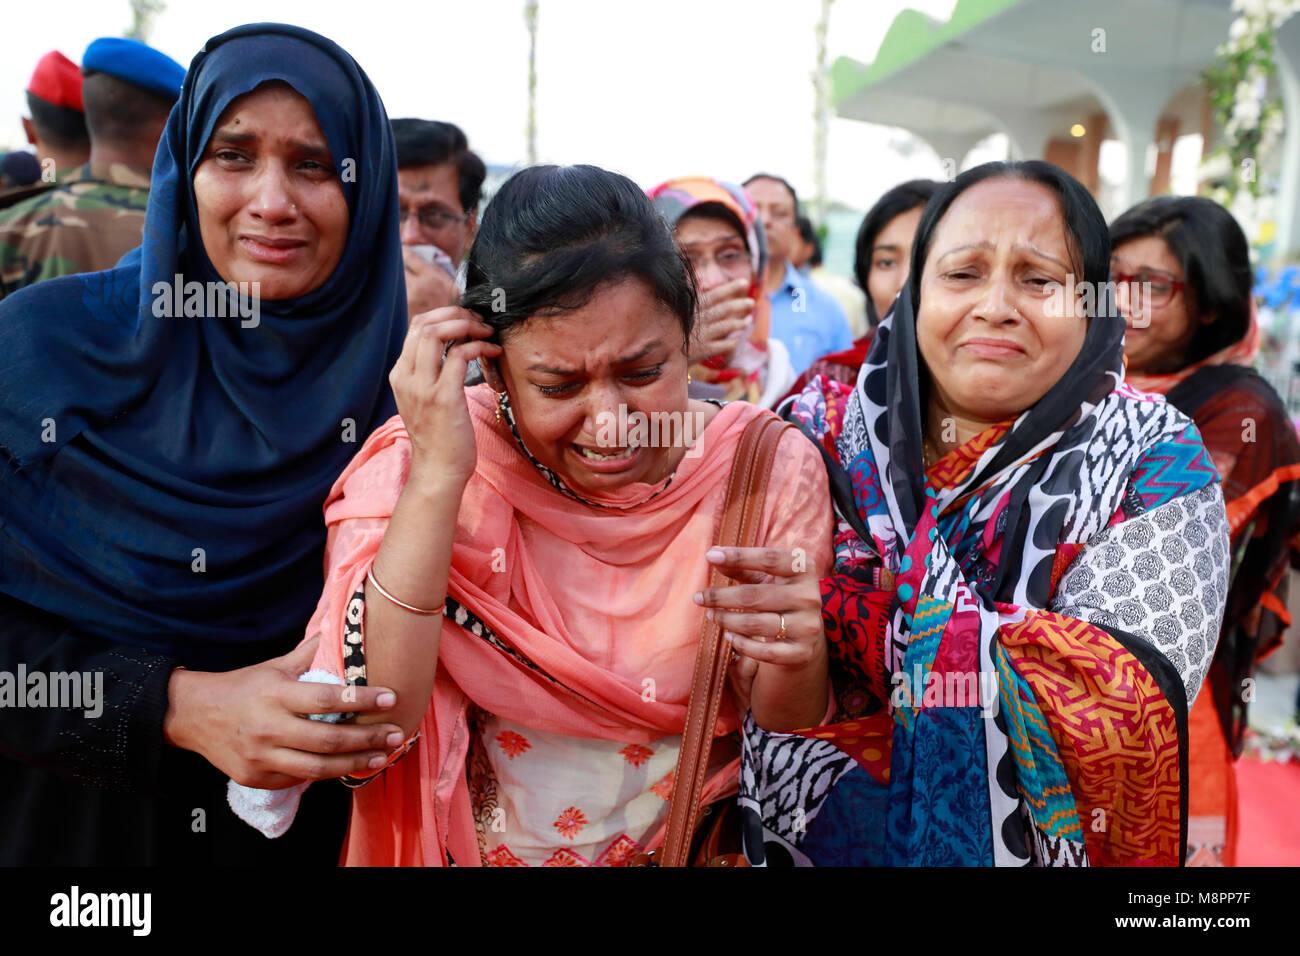 Dhaka, Bangladesh. 19th March, 2018.  Grief-stricken relatives of the US-Bangla plane crash victims at the Bangladesh - Stock Image